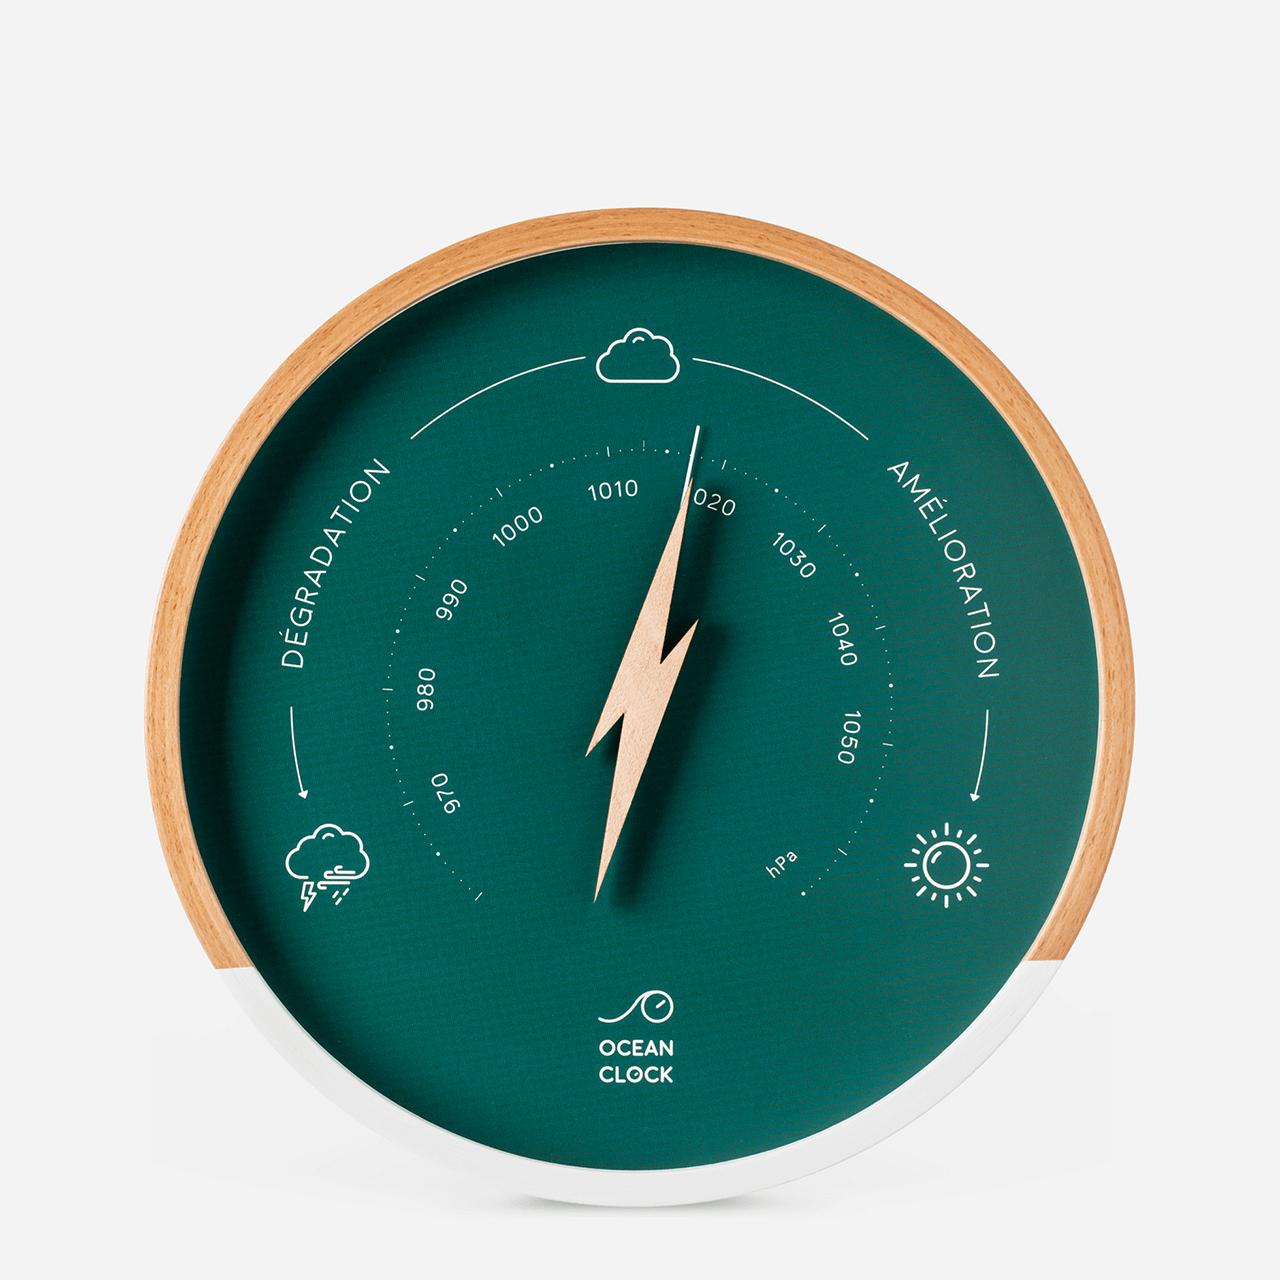 Horloge des marées copy of Coming soon - 2